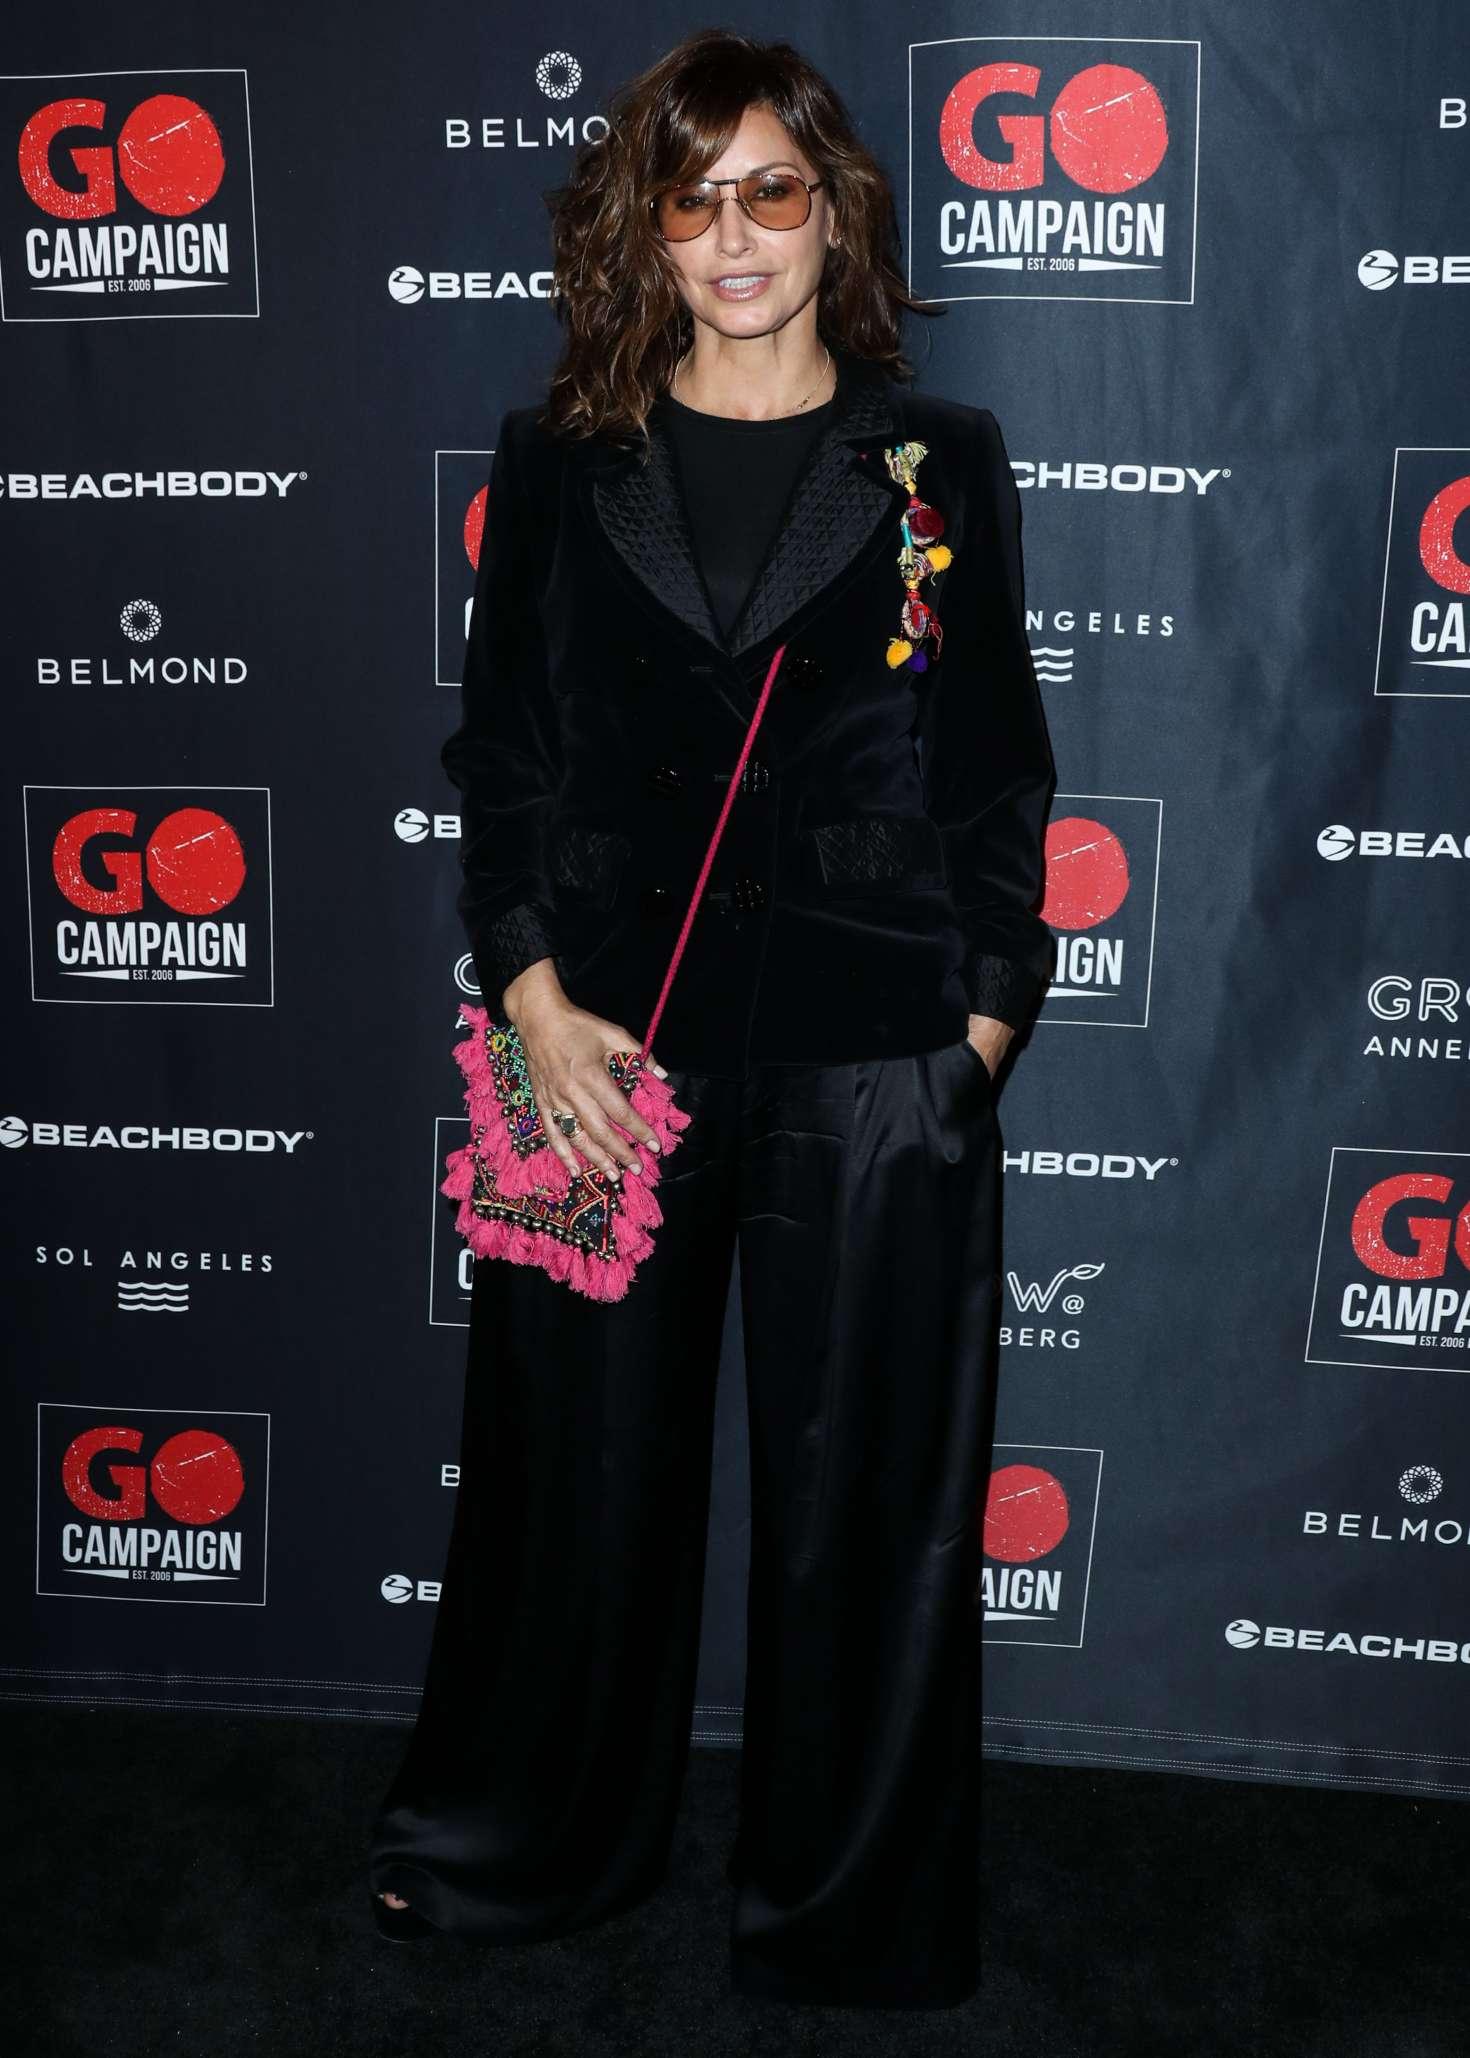 Gina Gershon 2018 : Gina Gershon: 2018 GO Campaign Gala -01